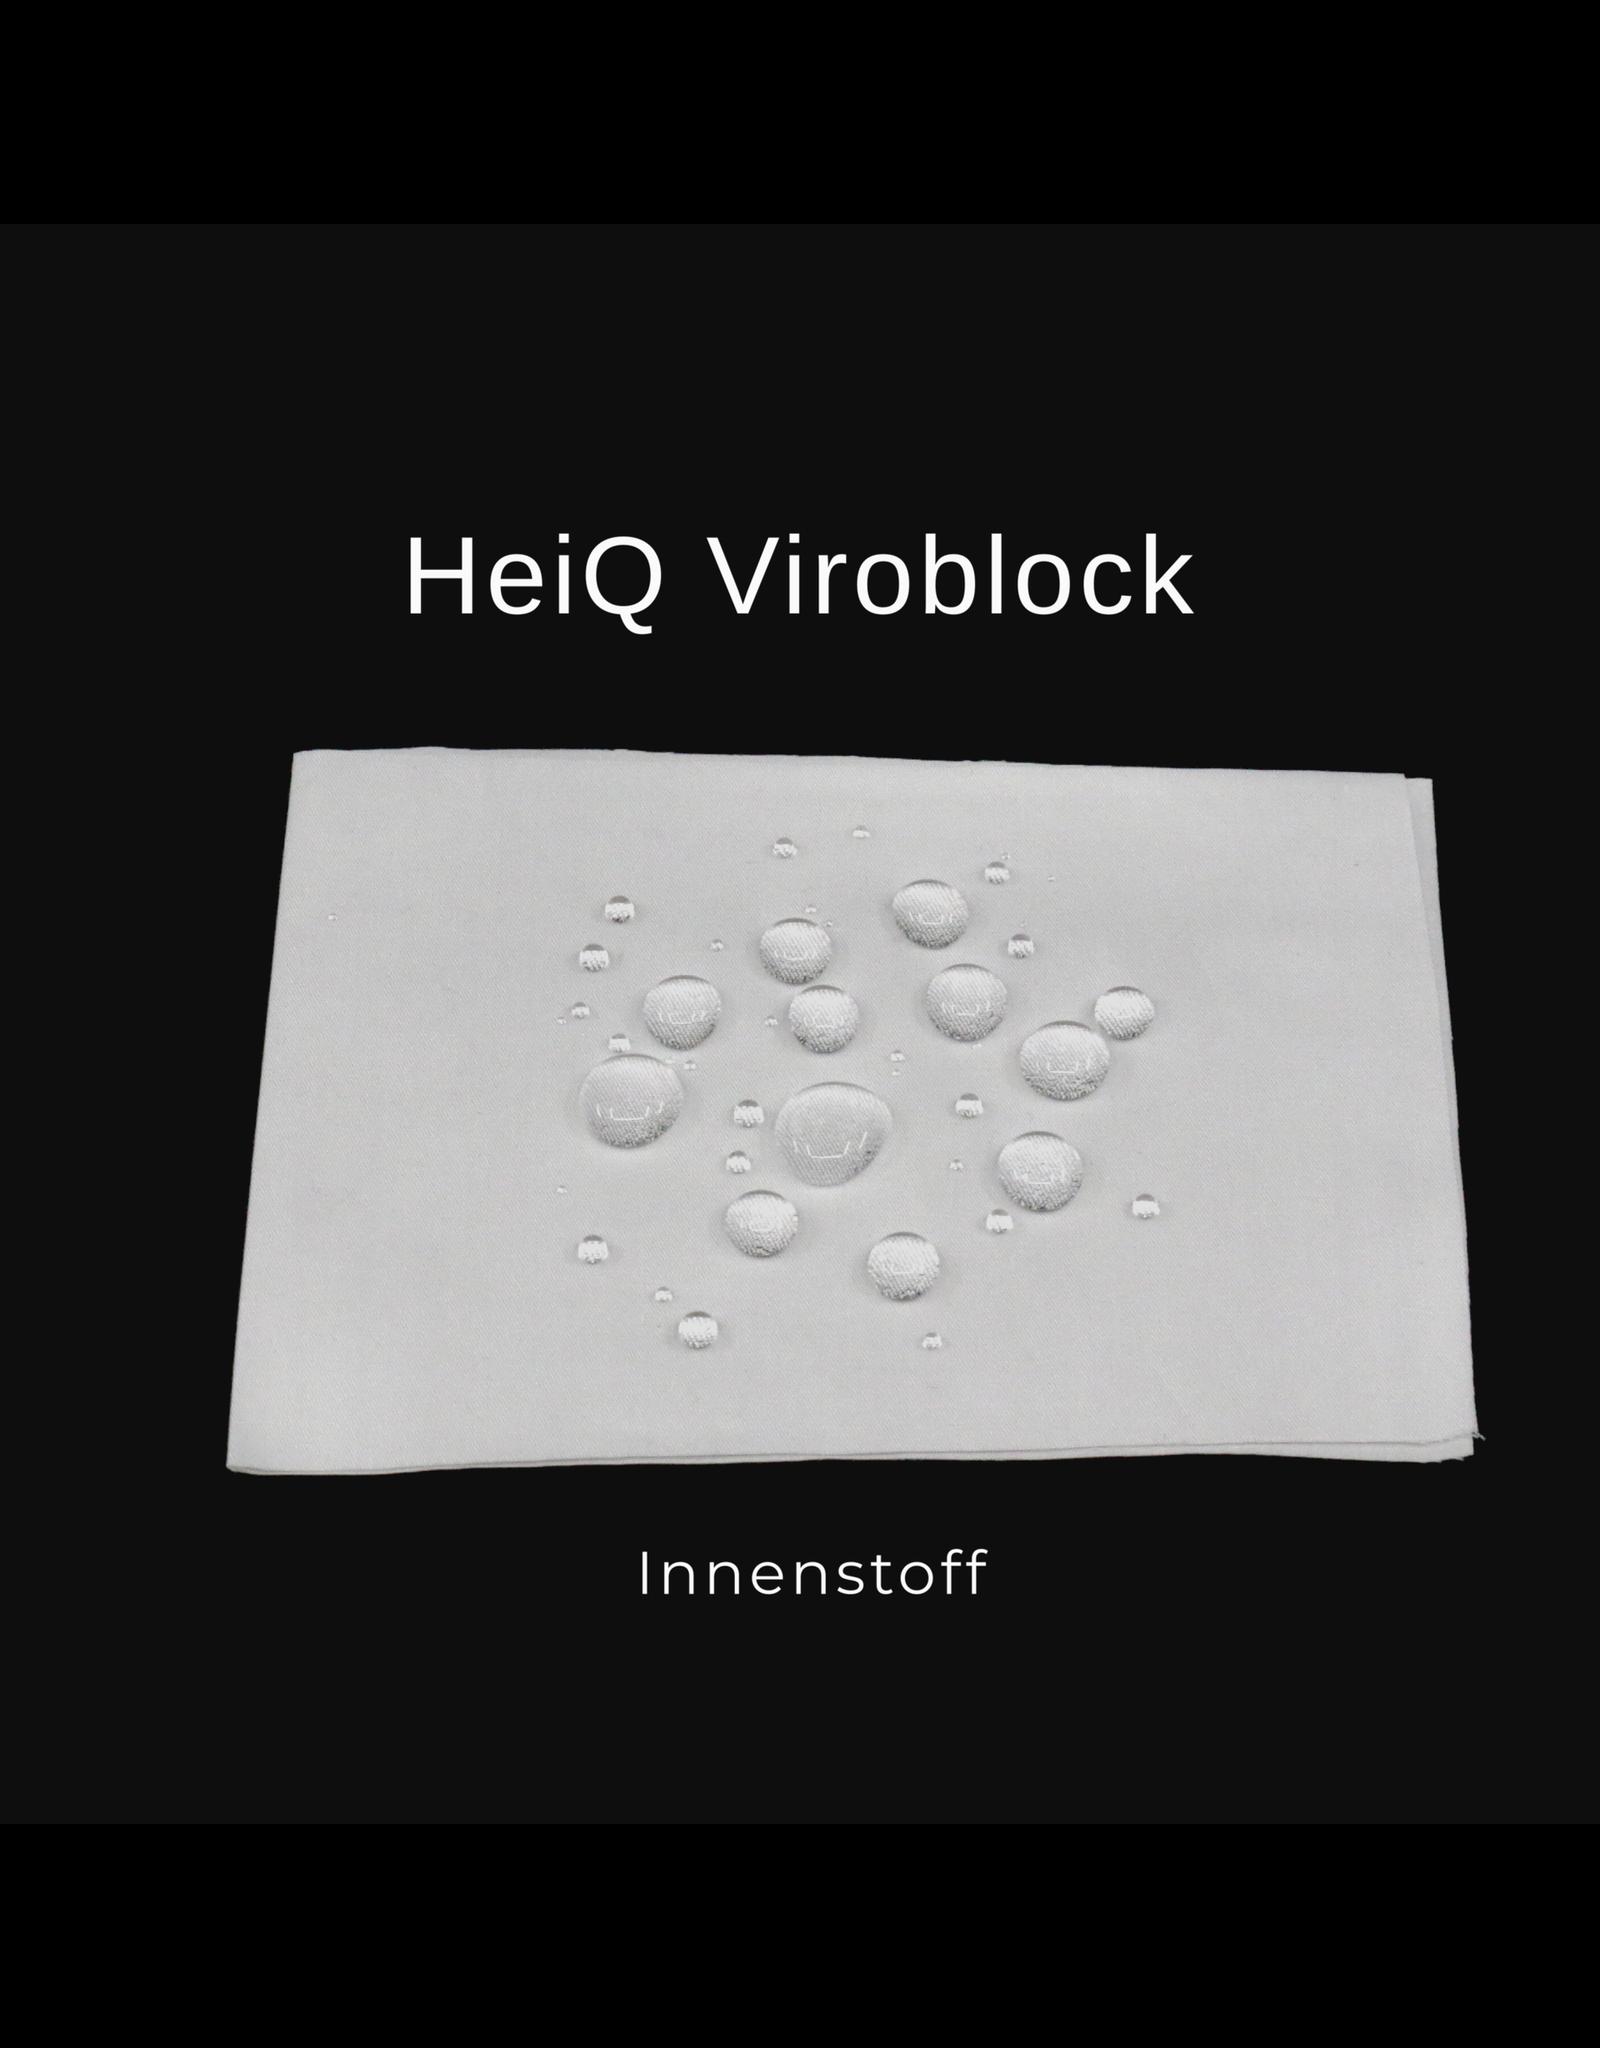 HeiqQ Viroblock Saas Fee